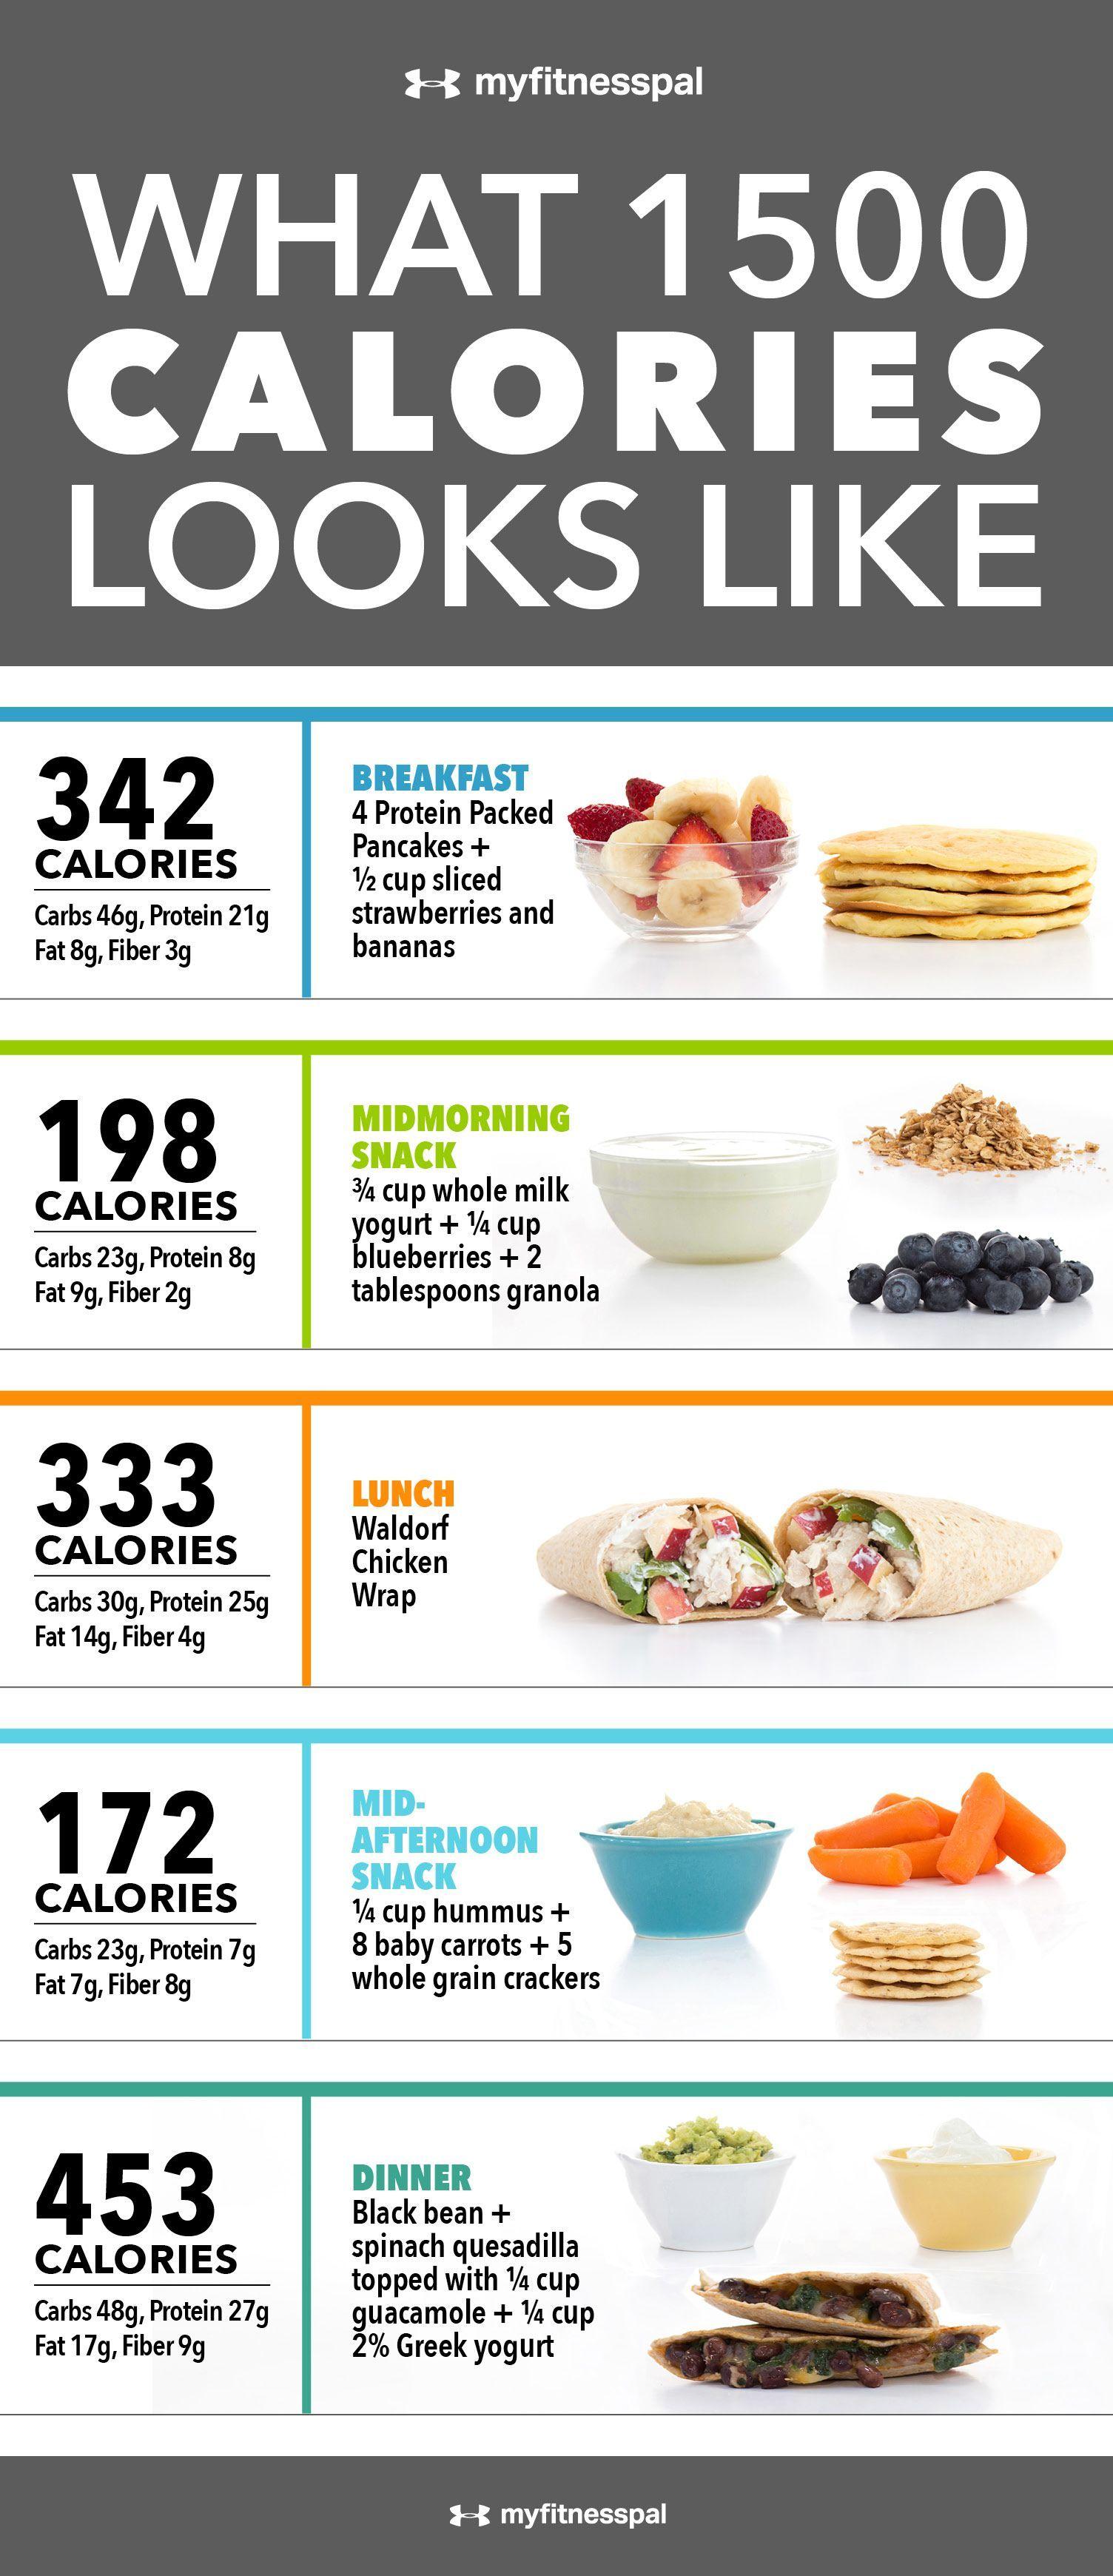 Full Diet Food Weightloss #dieta #DietPlanMenu #myfitnesspalrecipes